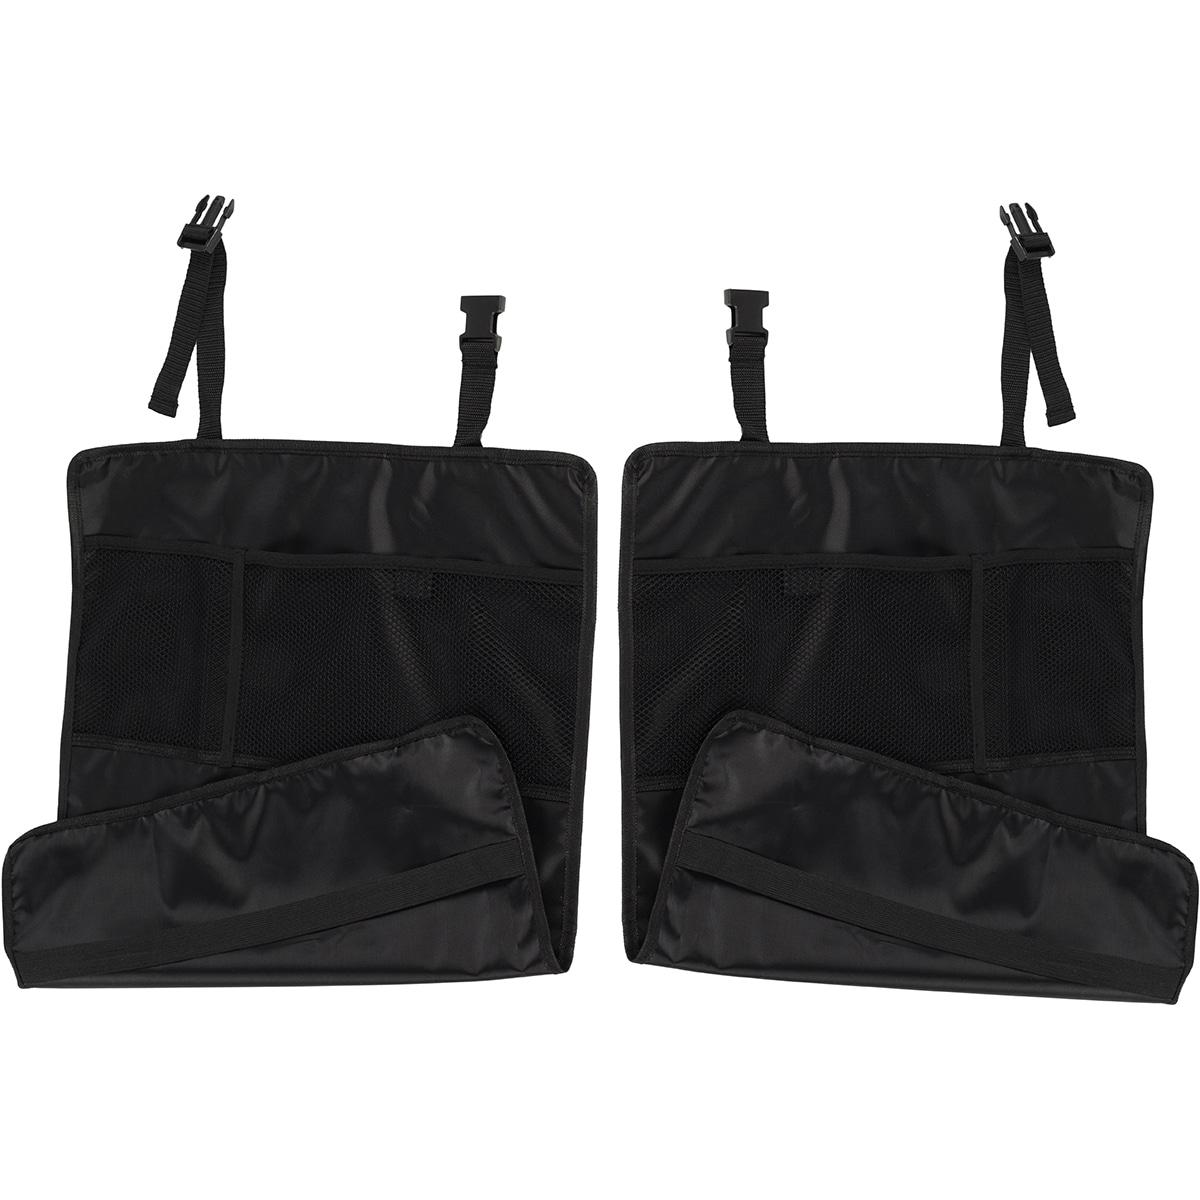 Oxgord Deluxe Car Seat Cover Kick Mats (Set of 2) (Black ...